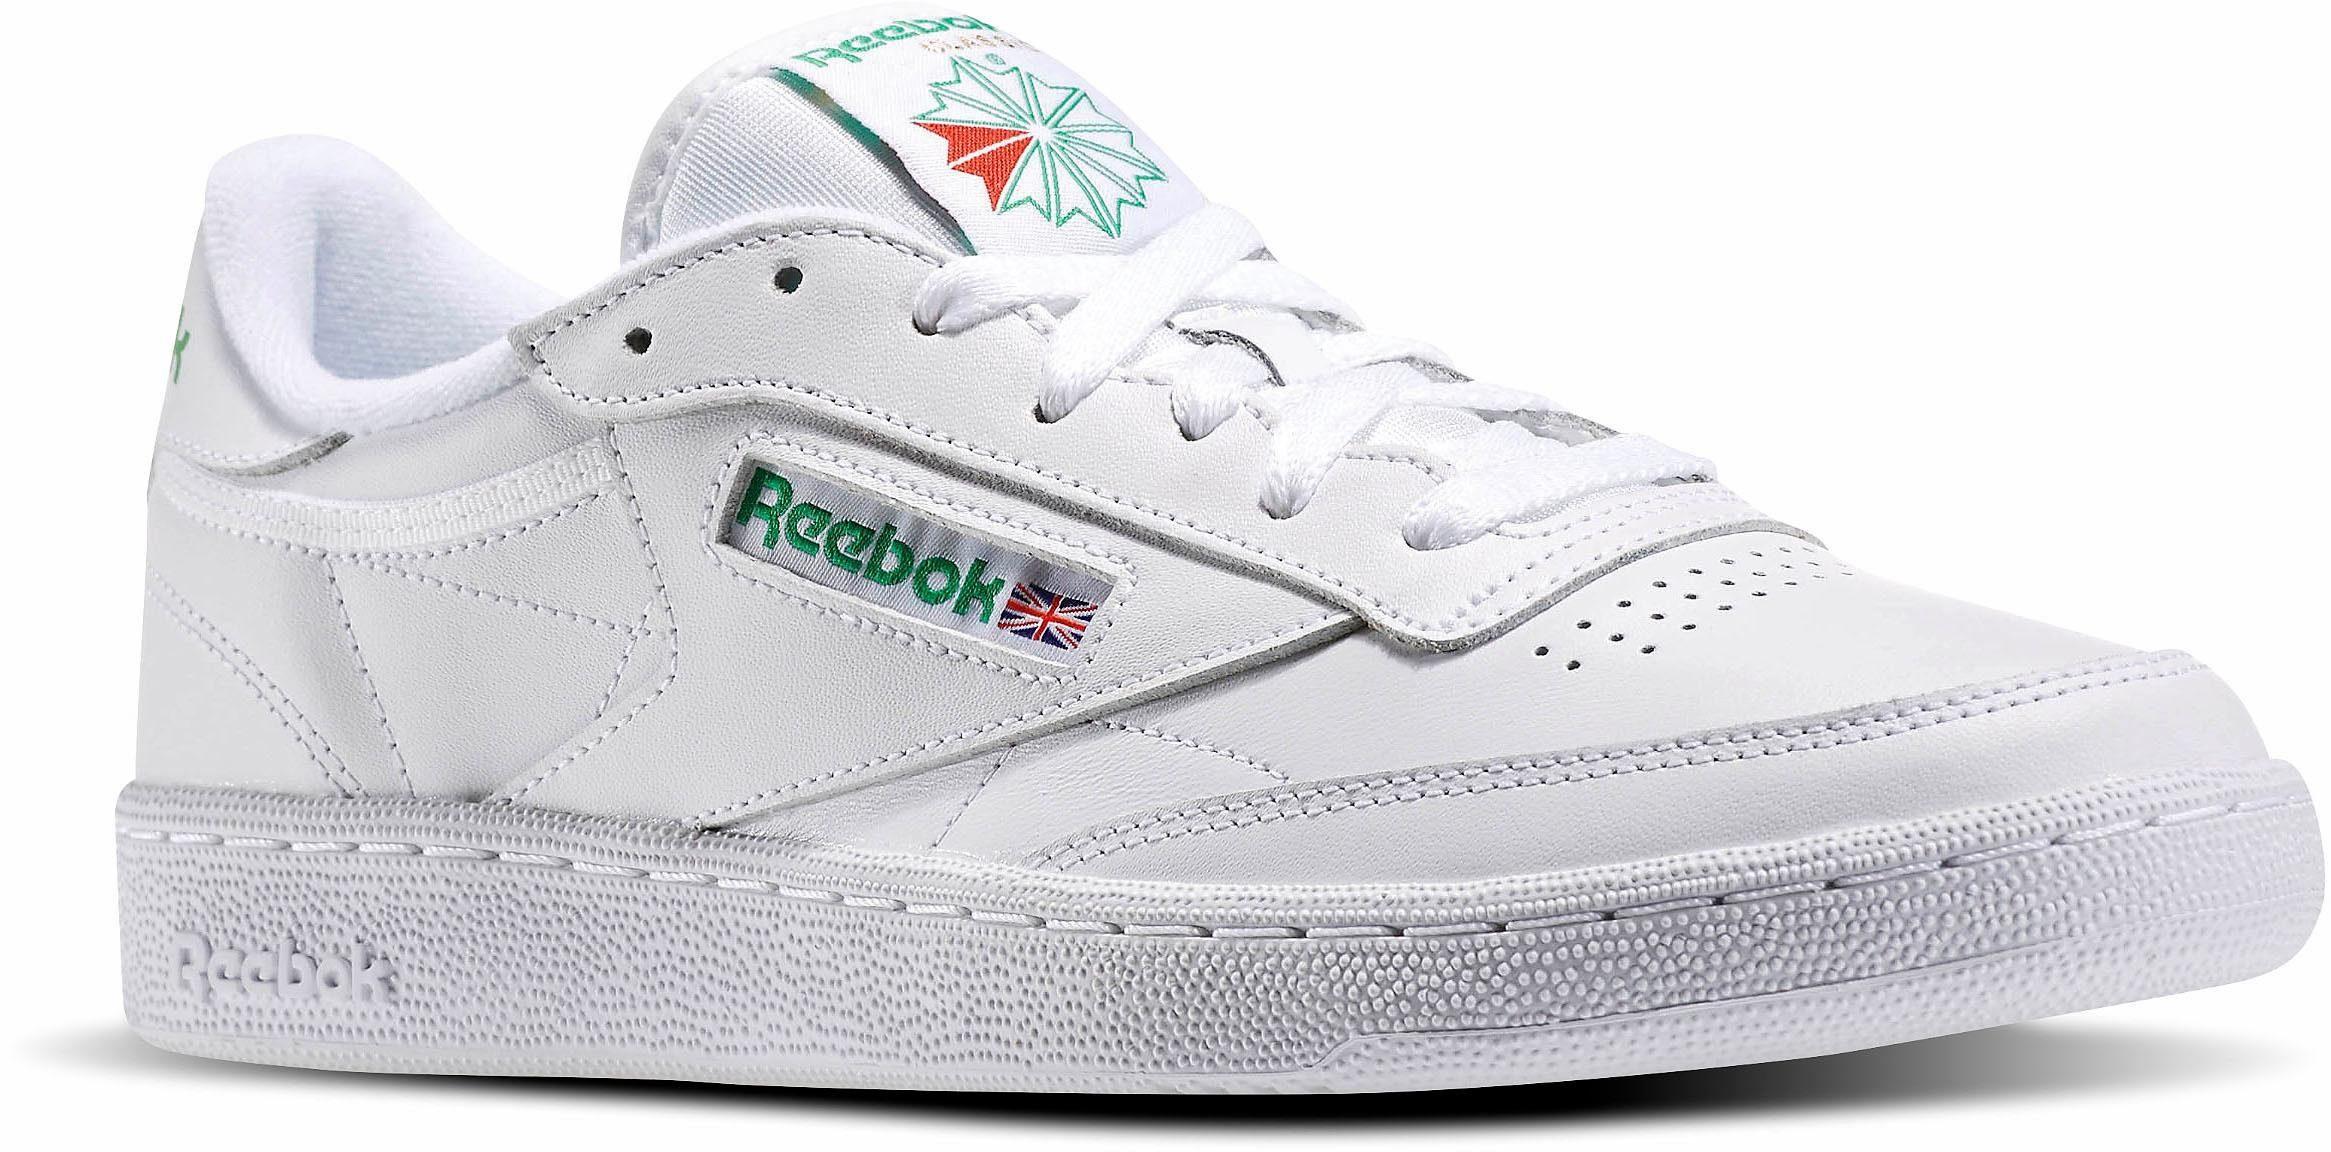 Reebok Classic Club C 85 Sneaker online kaufen  weiß-grün